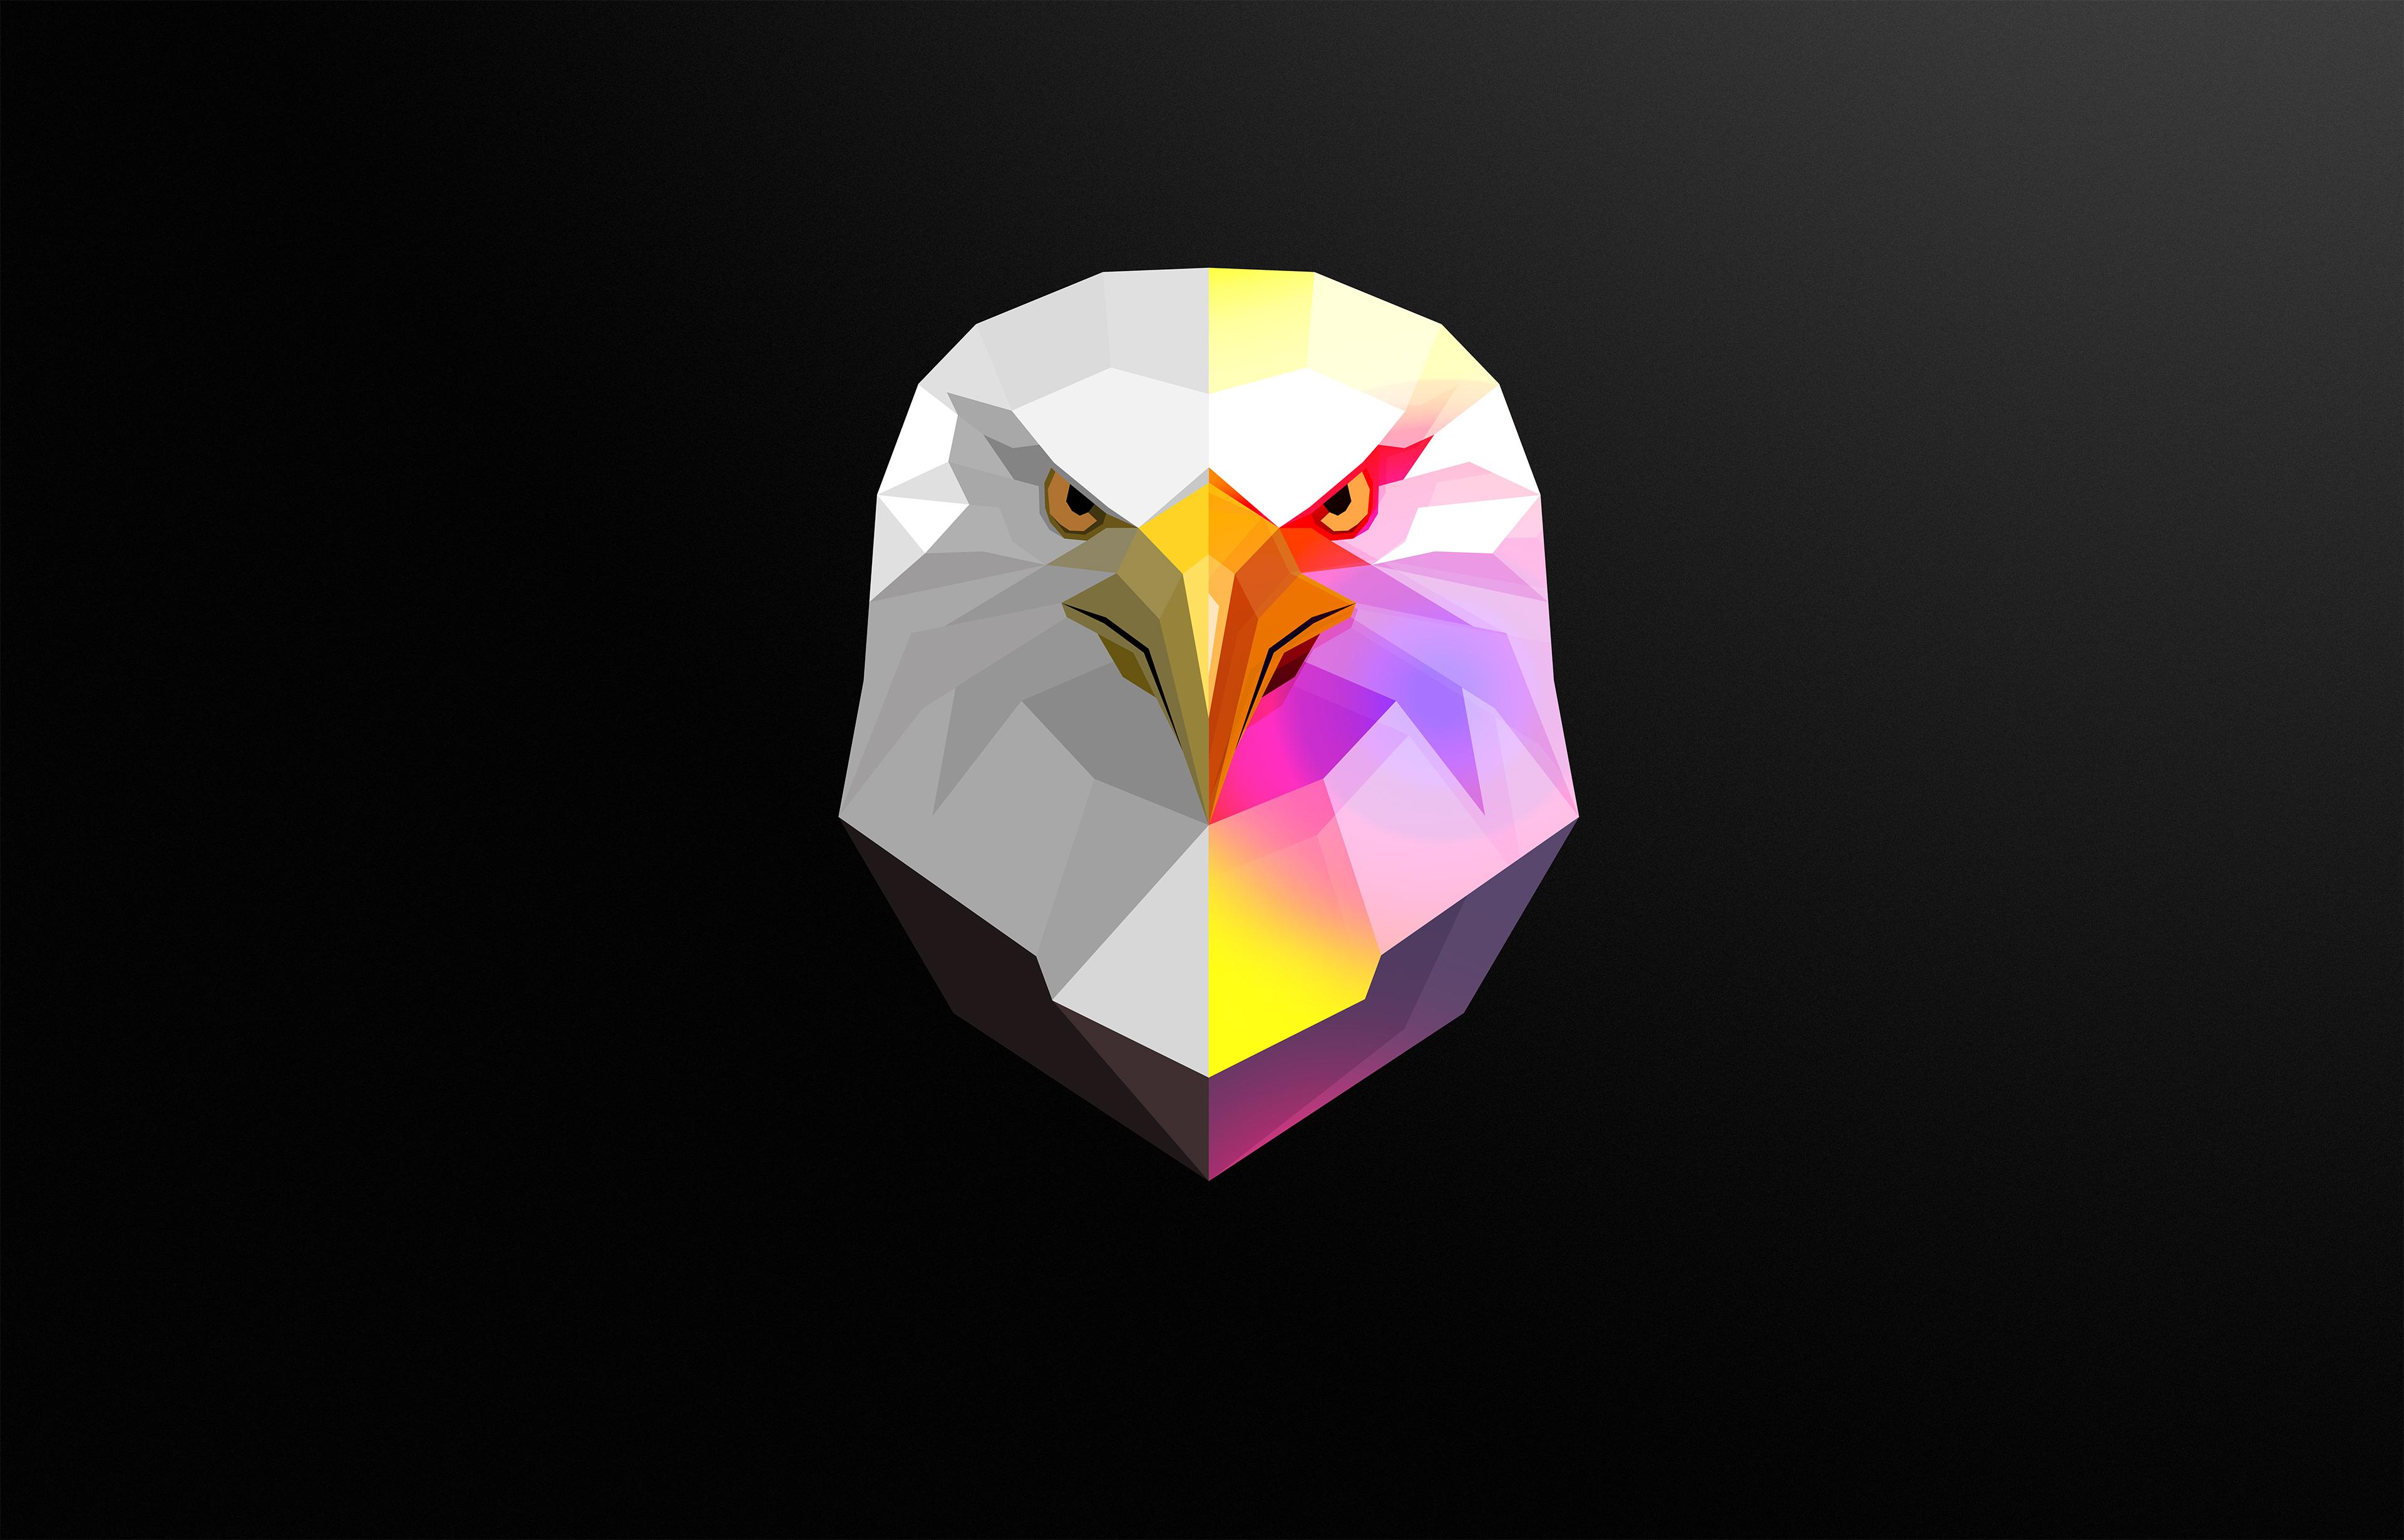 General 3840x2460 byrotek  abstract animals eagle dark digital art minimalism birds